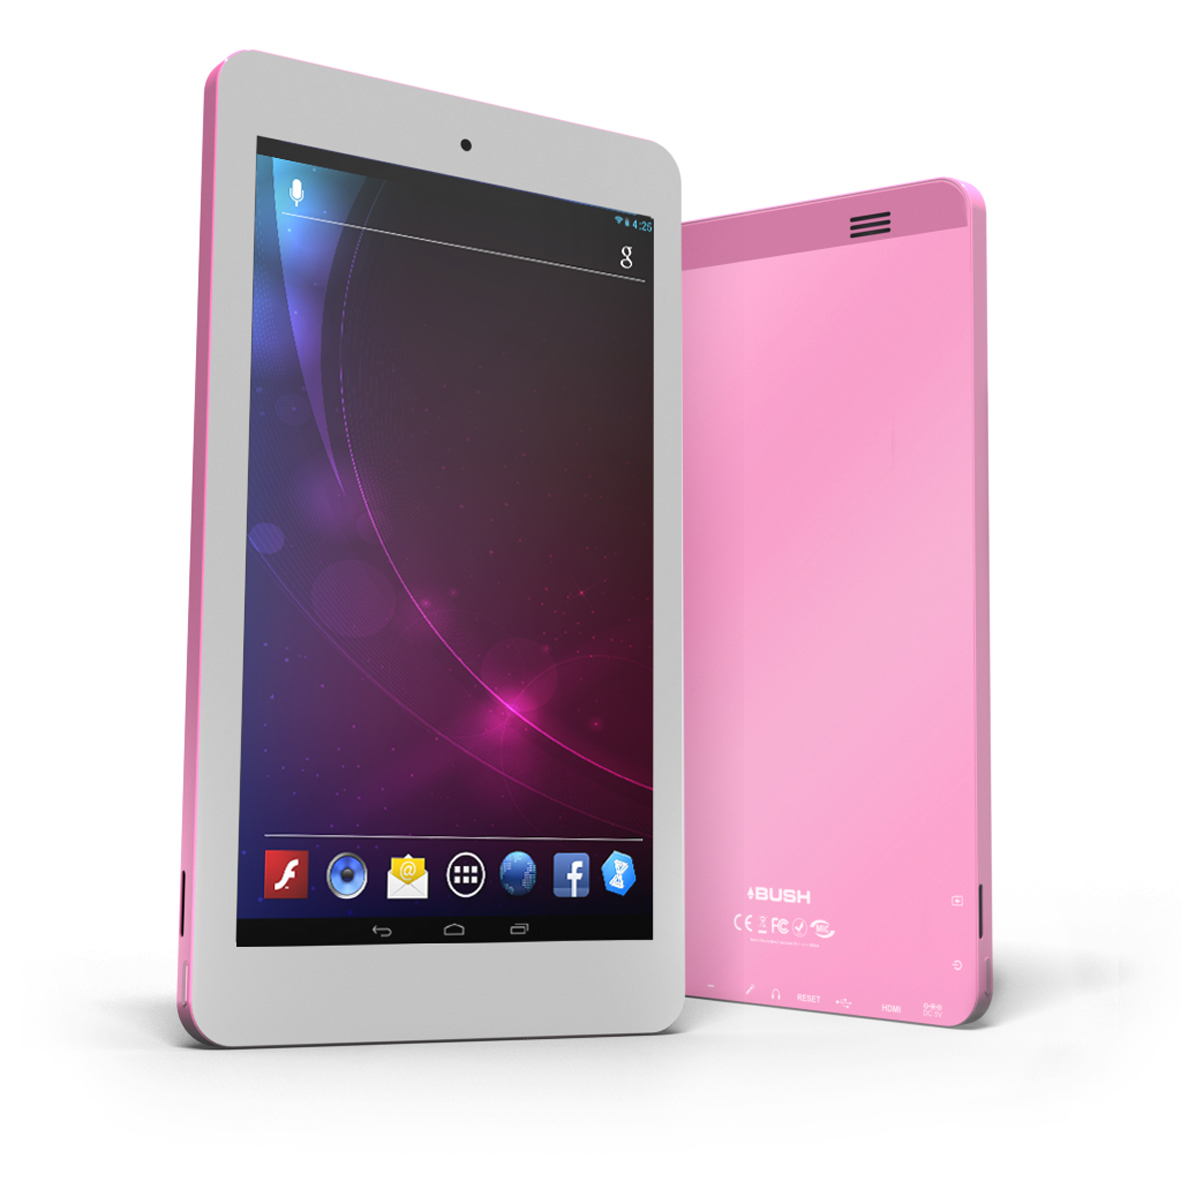 UK Retailer Argos Launches Own Tablet